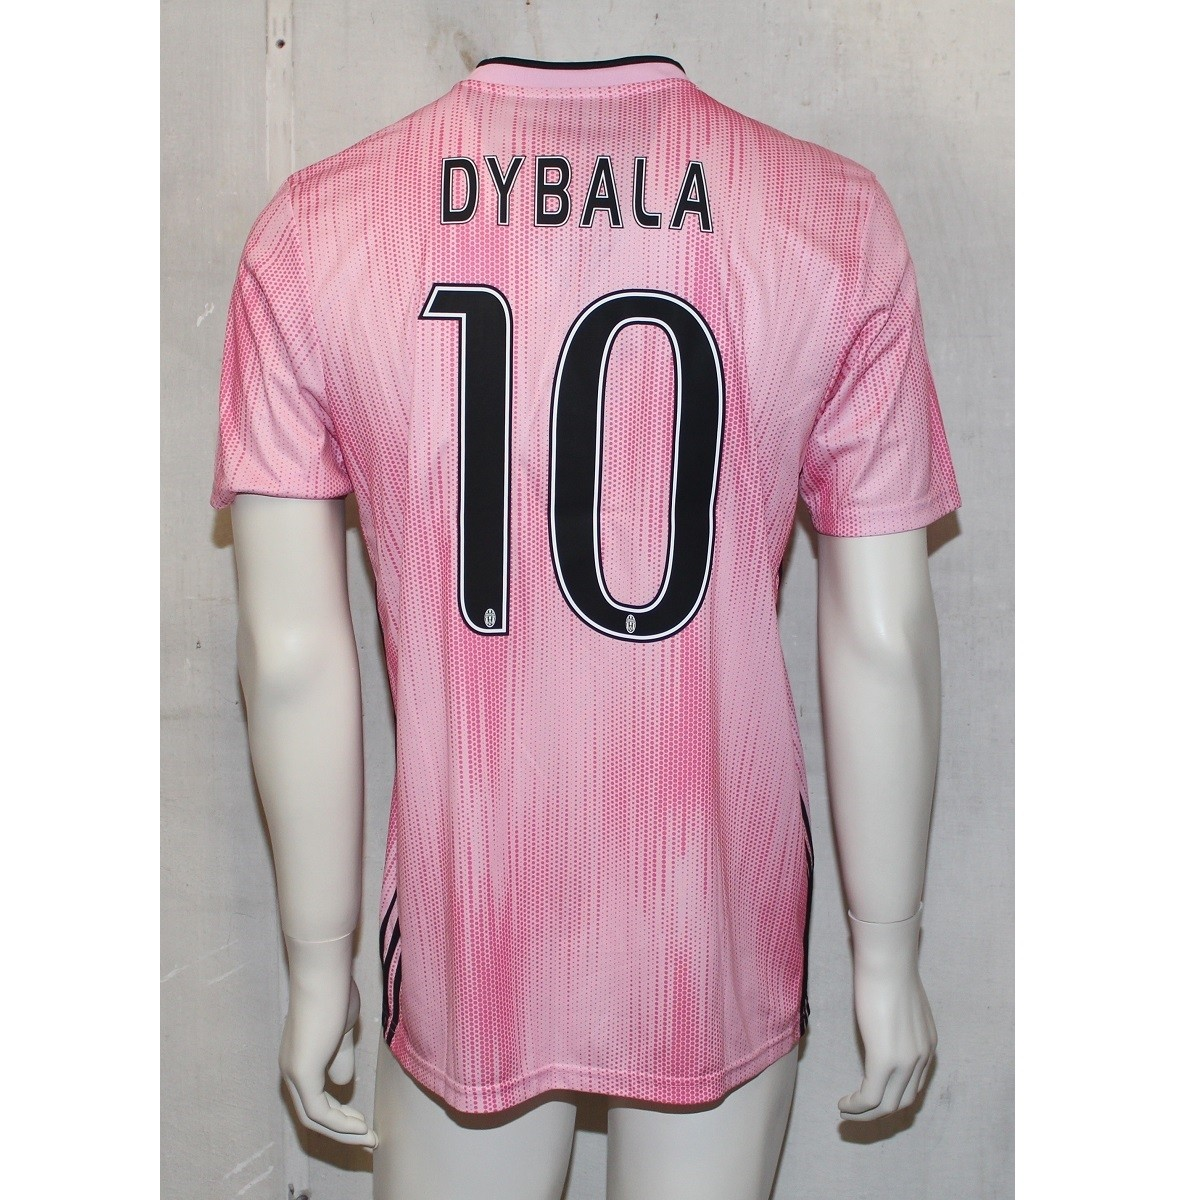 Tiro 19 jersey - Dybala 10